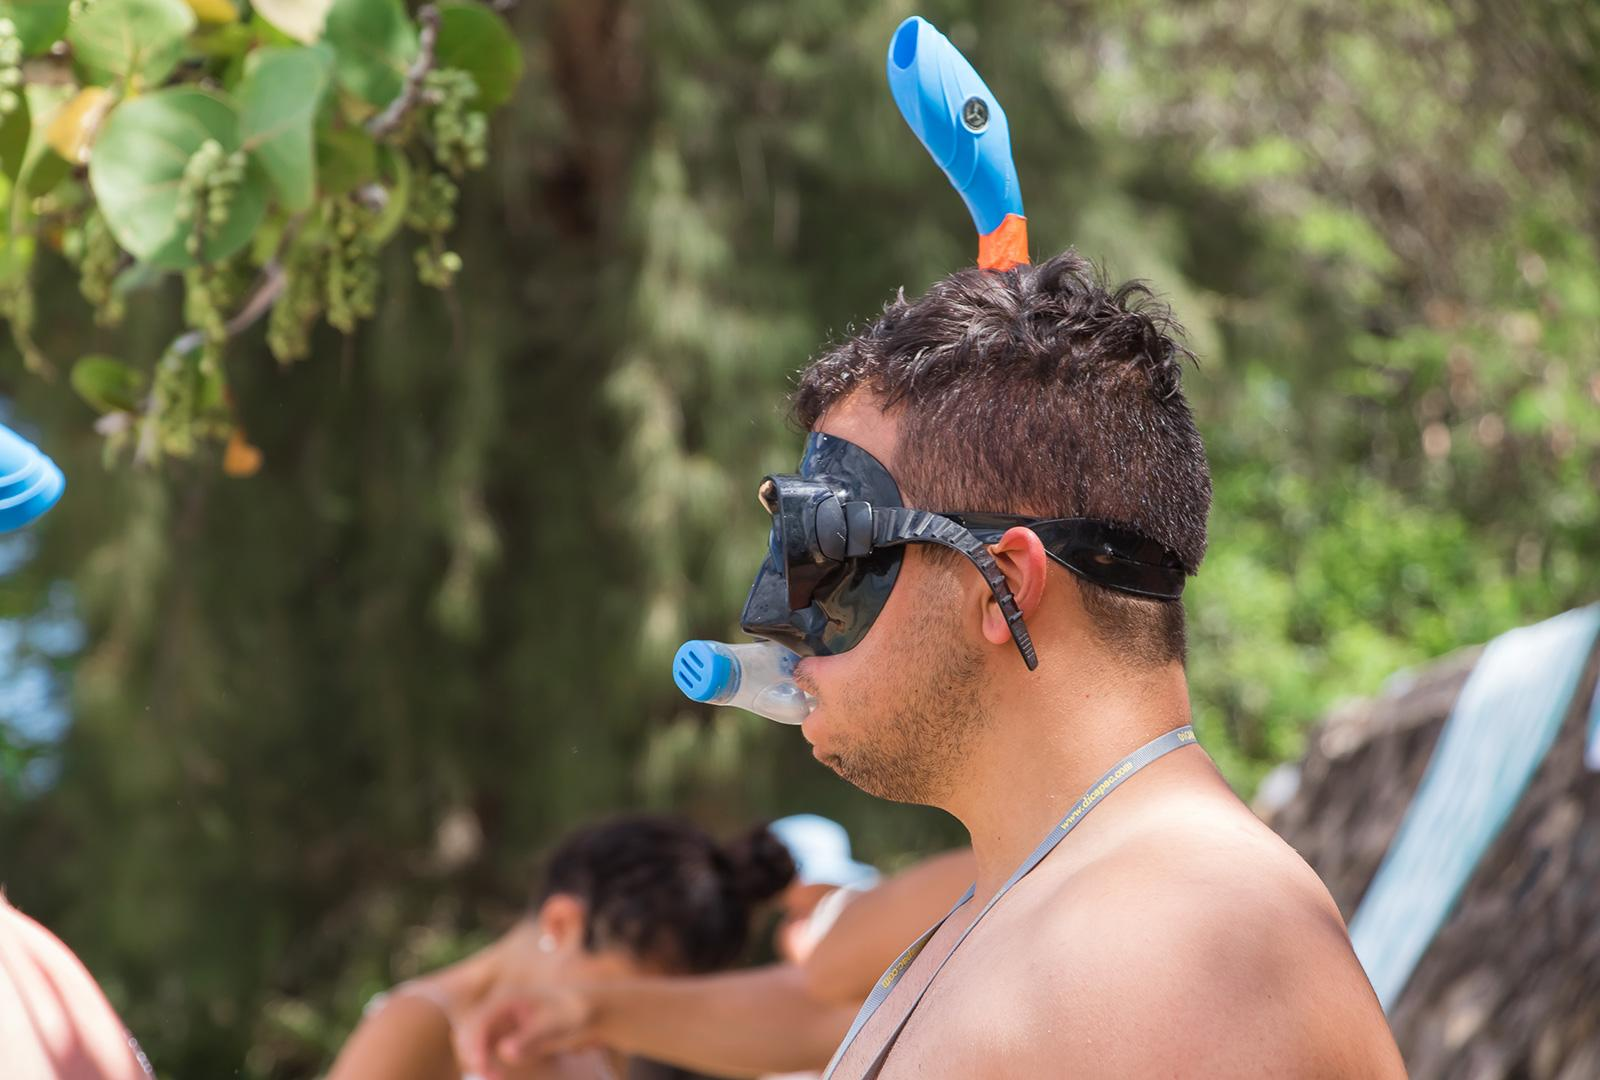 Men Snorkeling in Mask